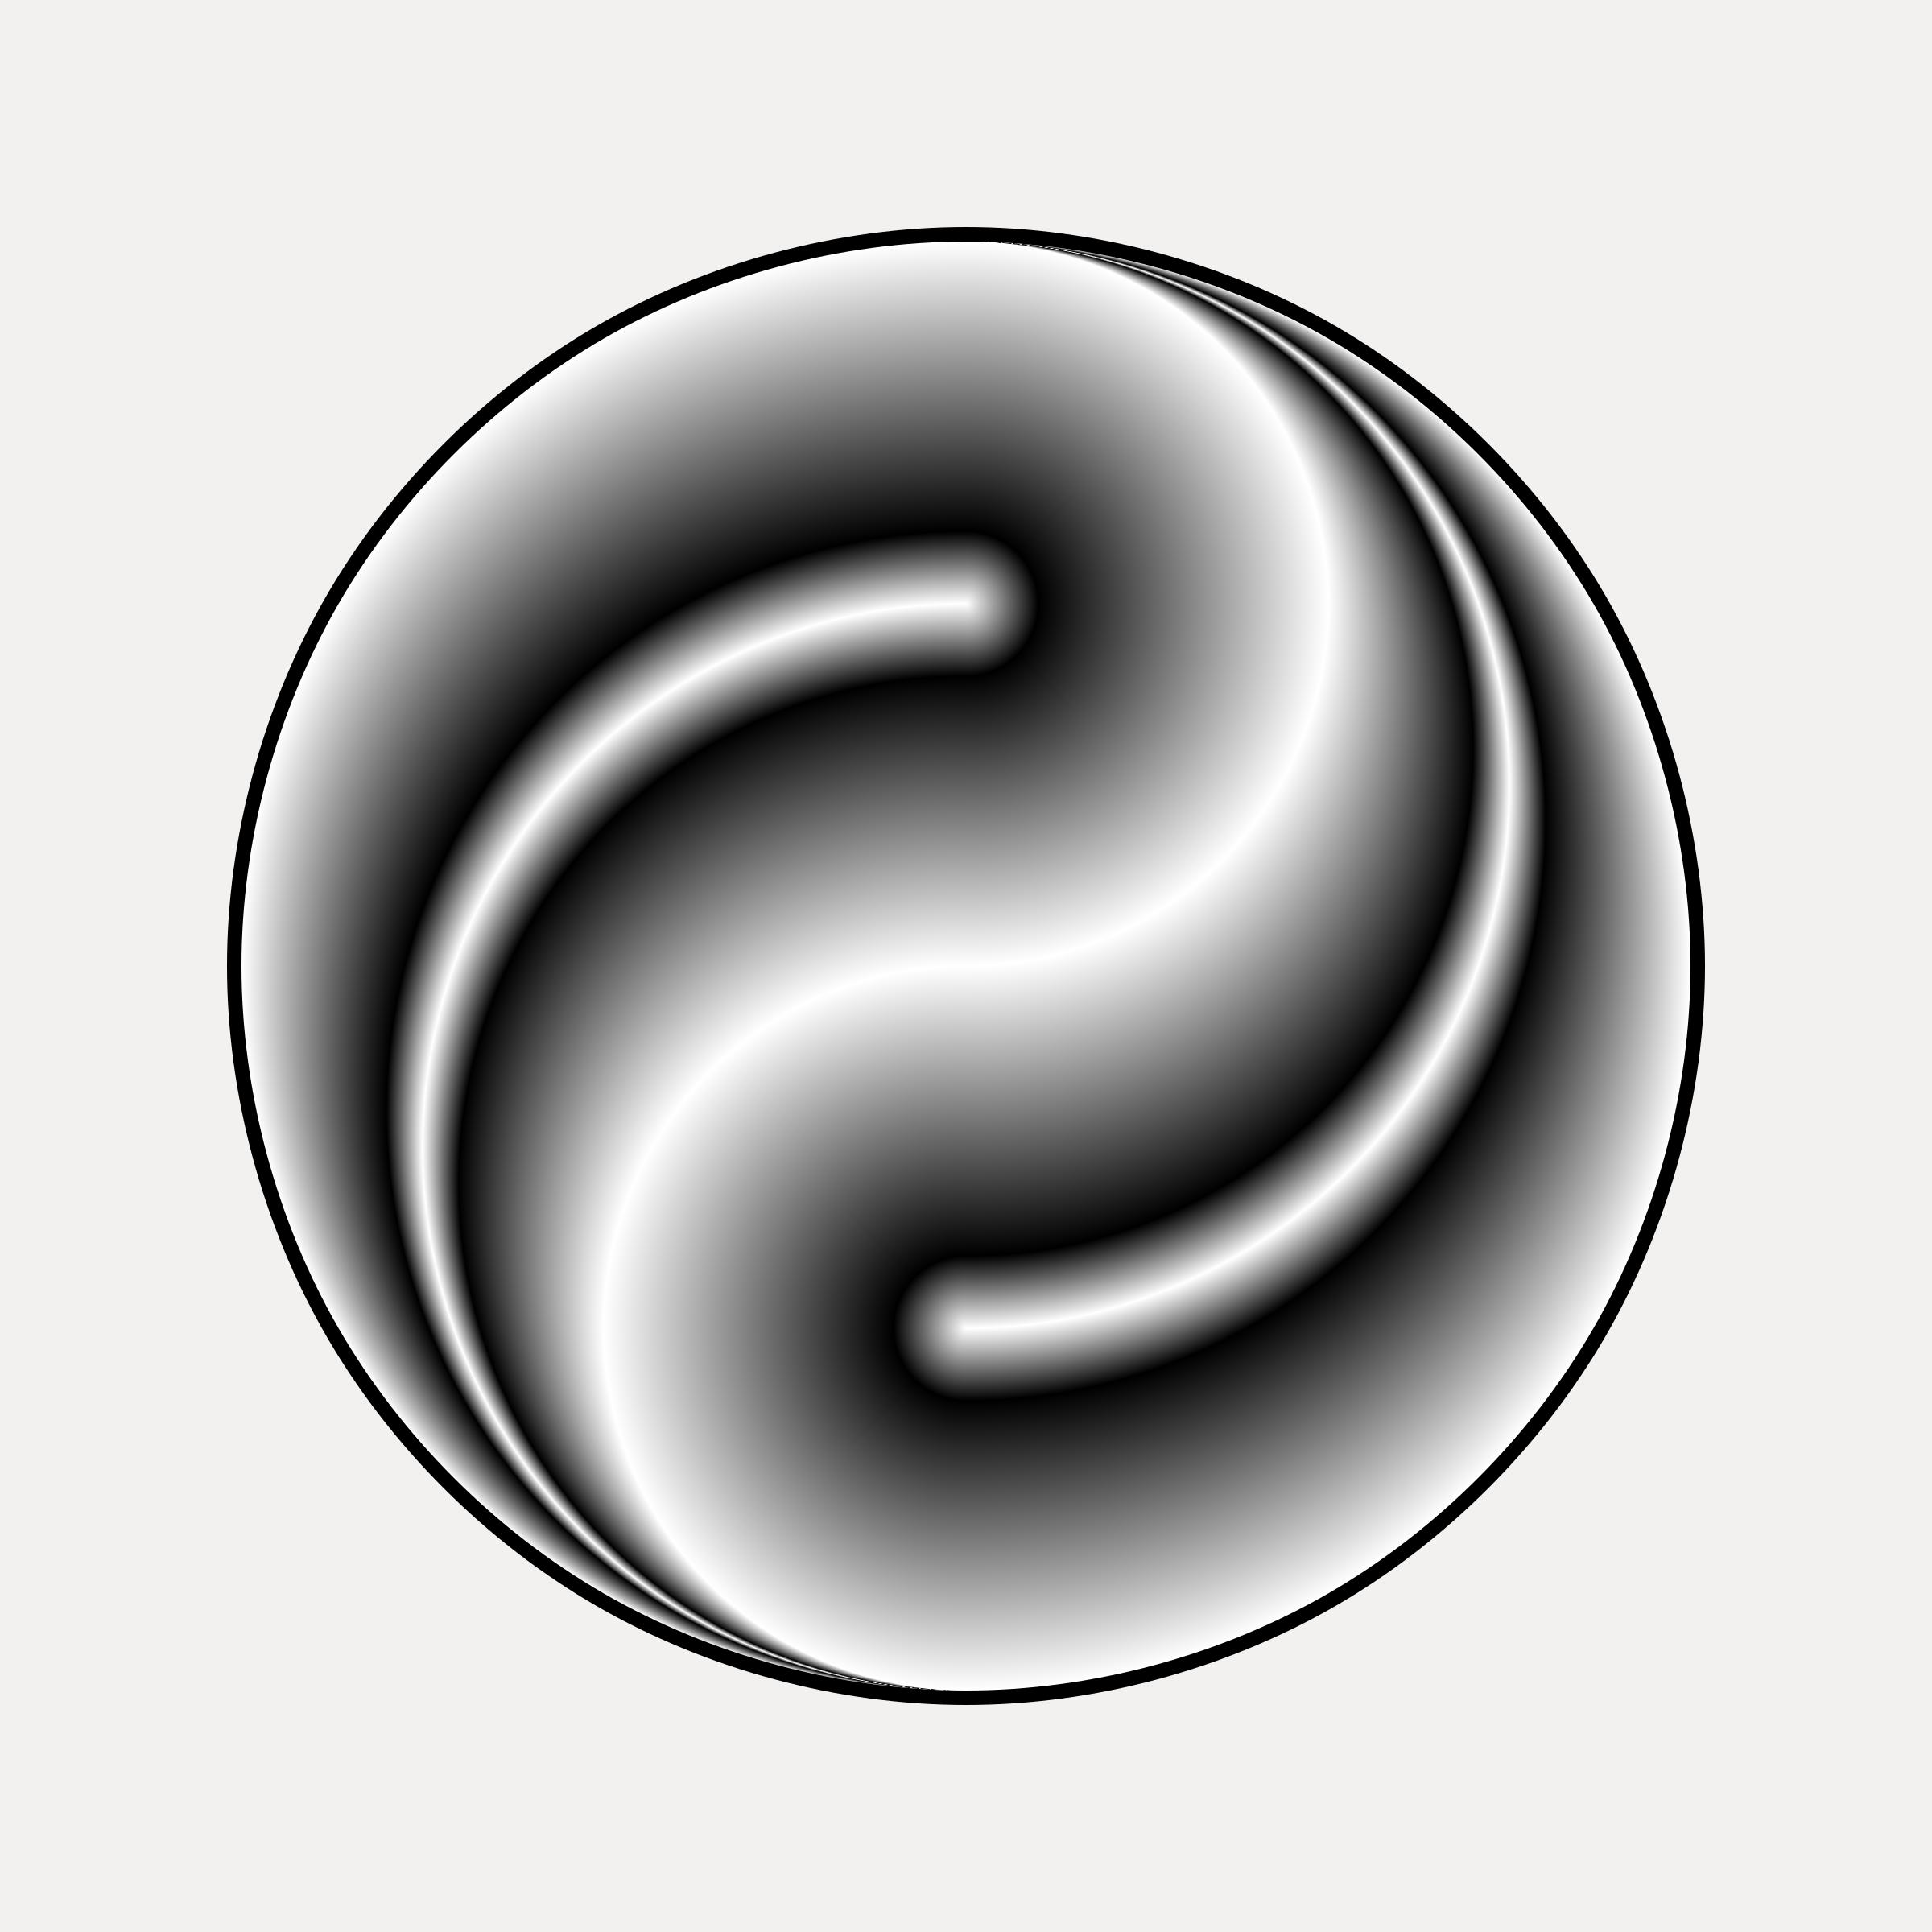 Clipart yin yang